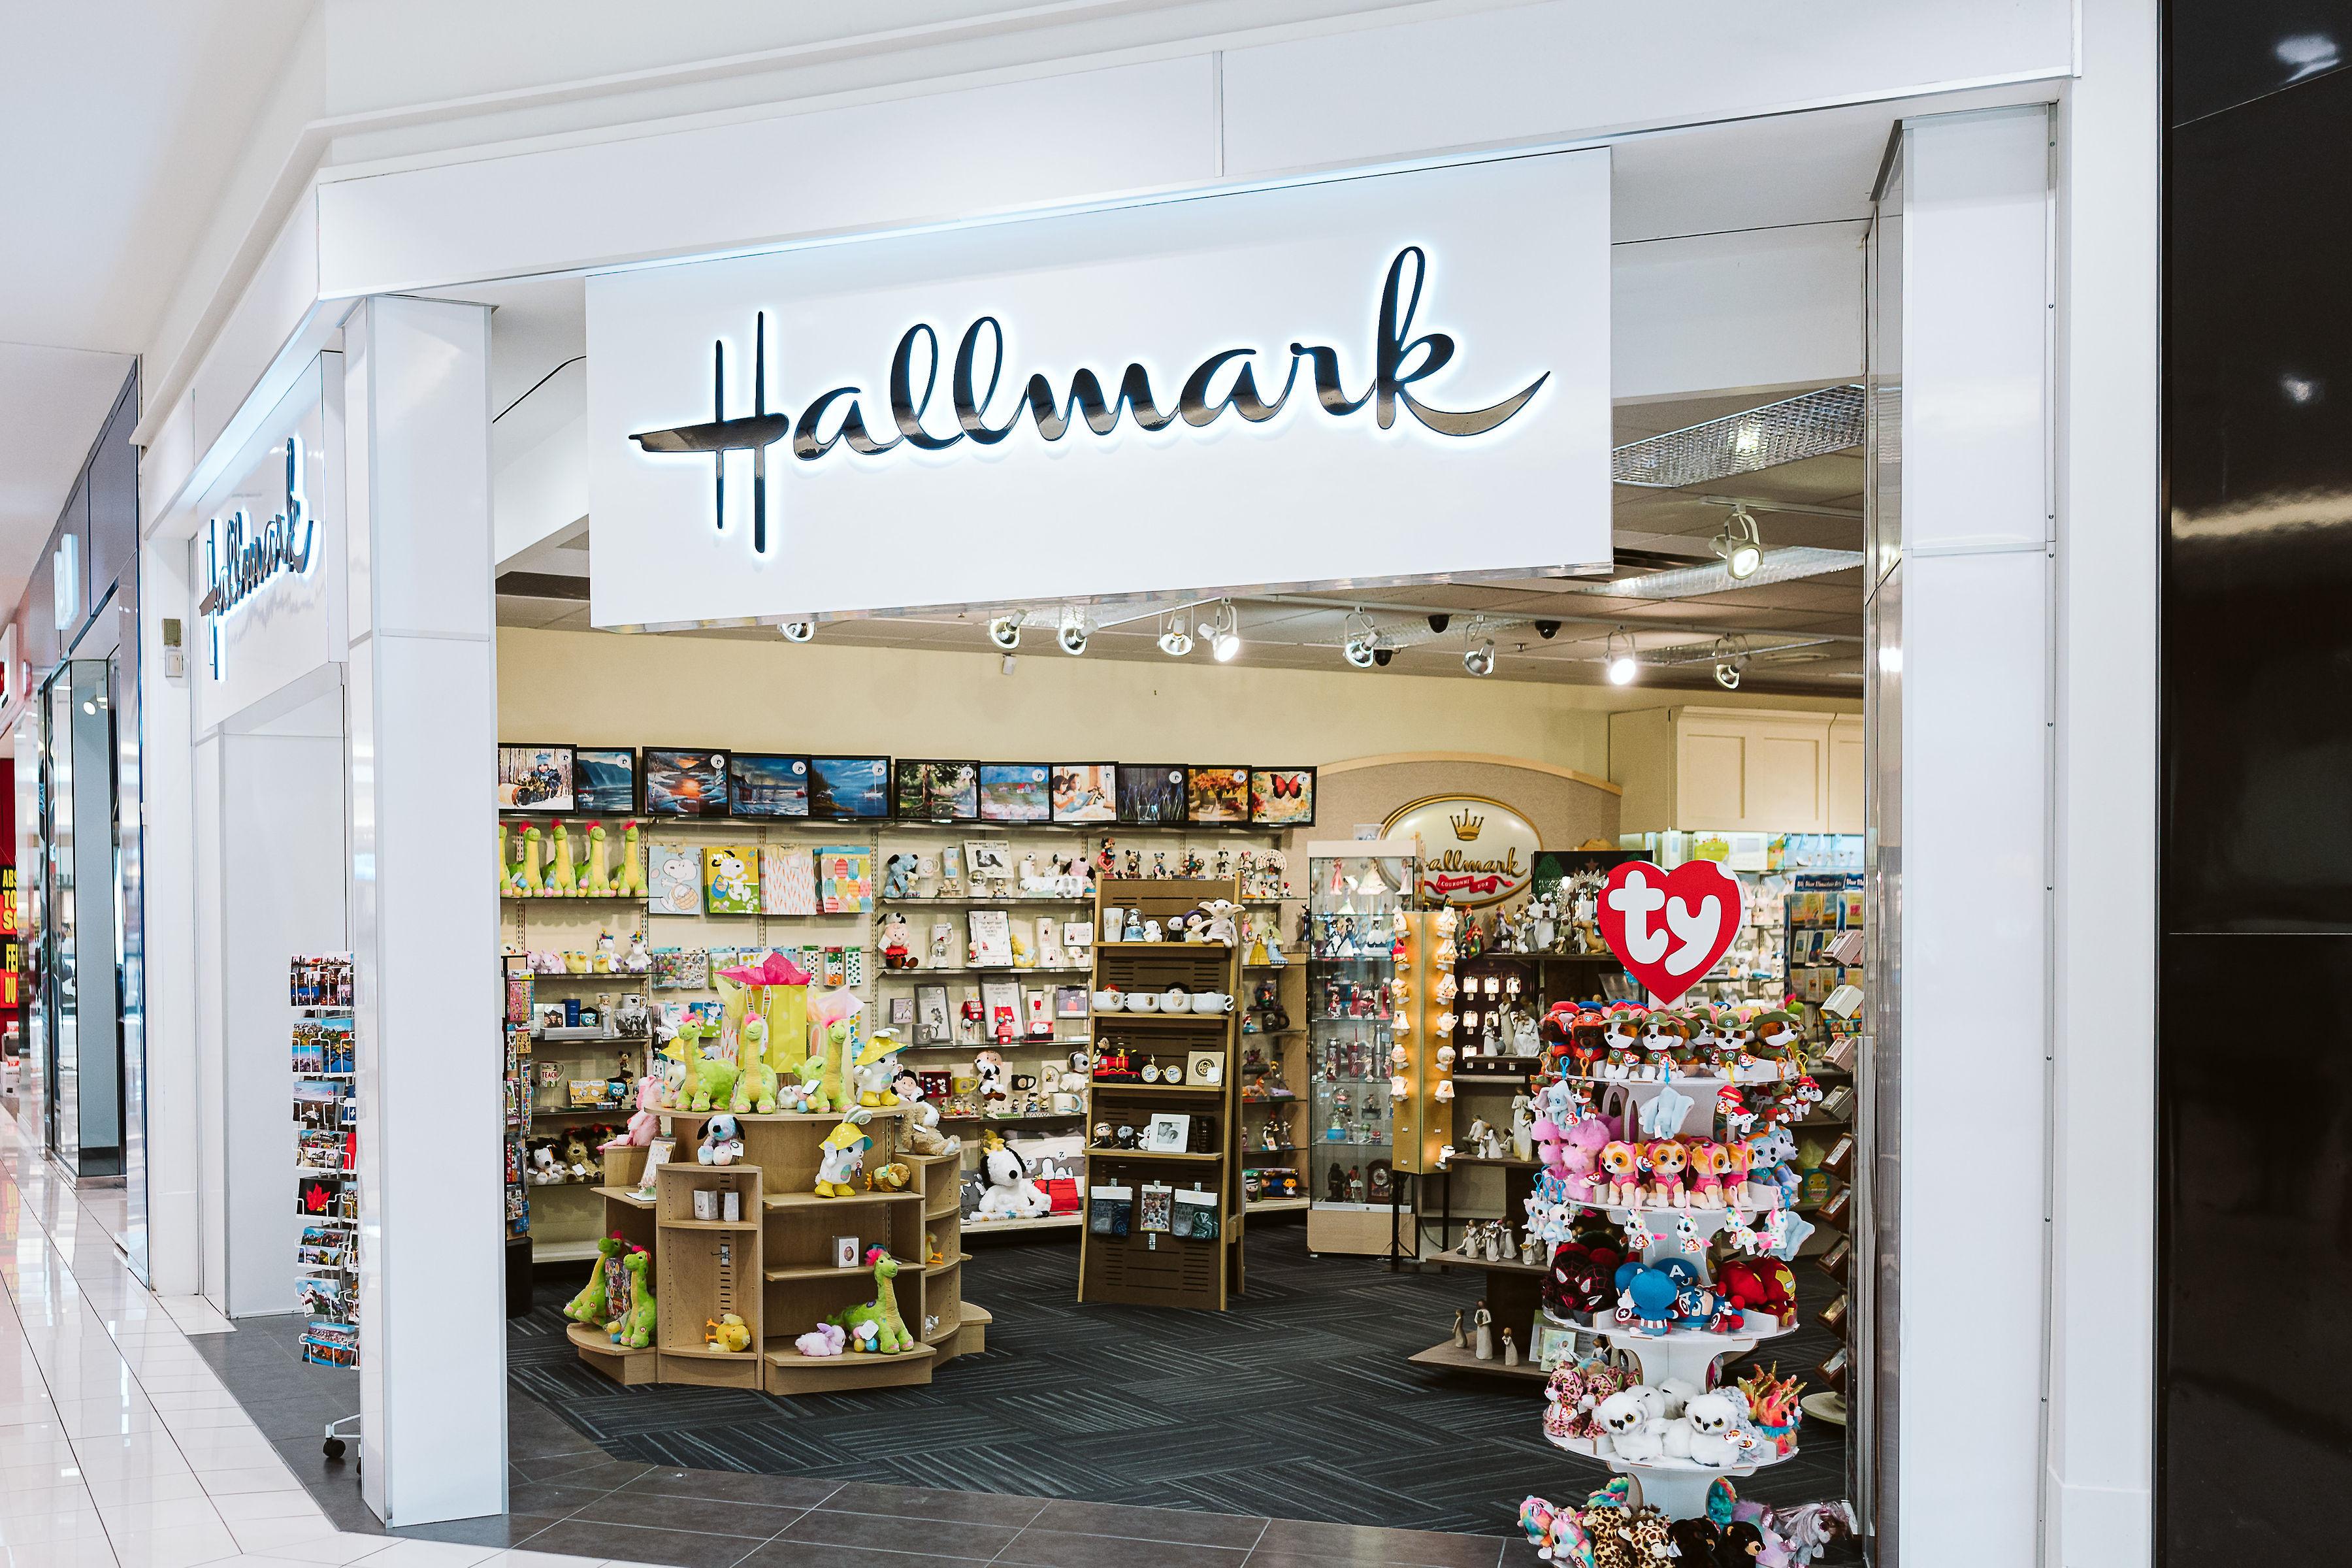 Hallmark - Mail Champlain